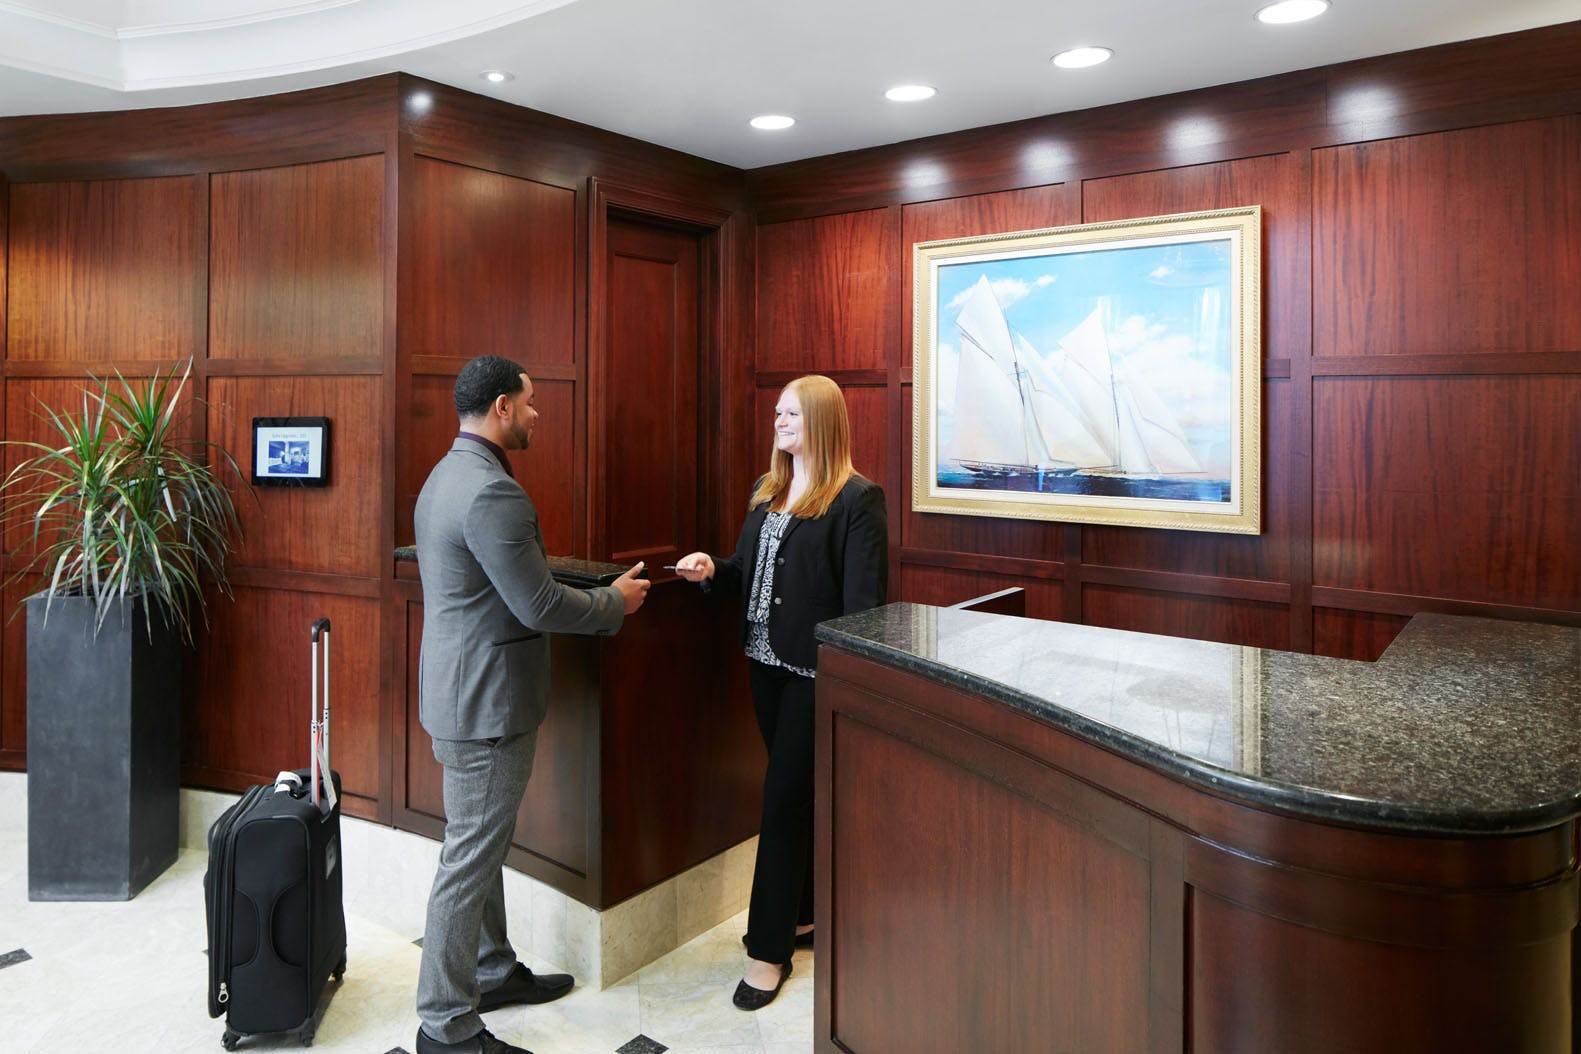 Member Service Desk at Club Quarters Hotel in Boston